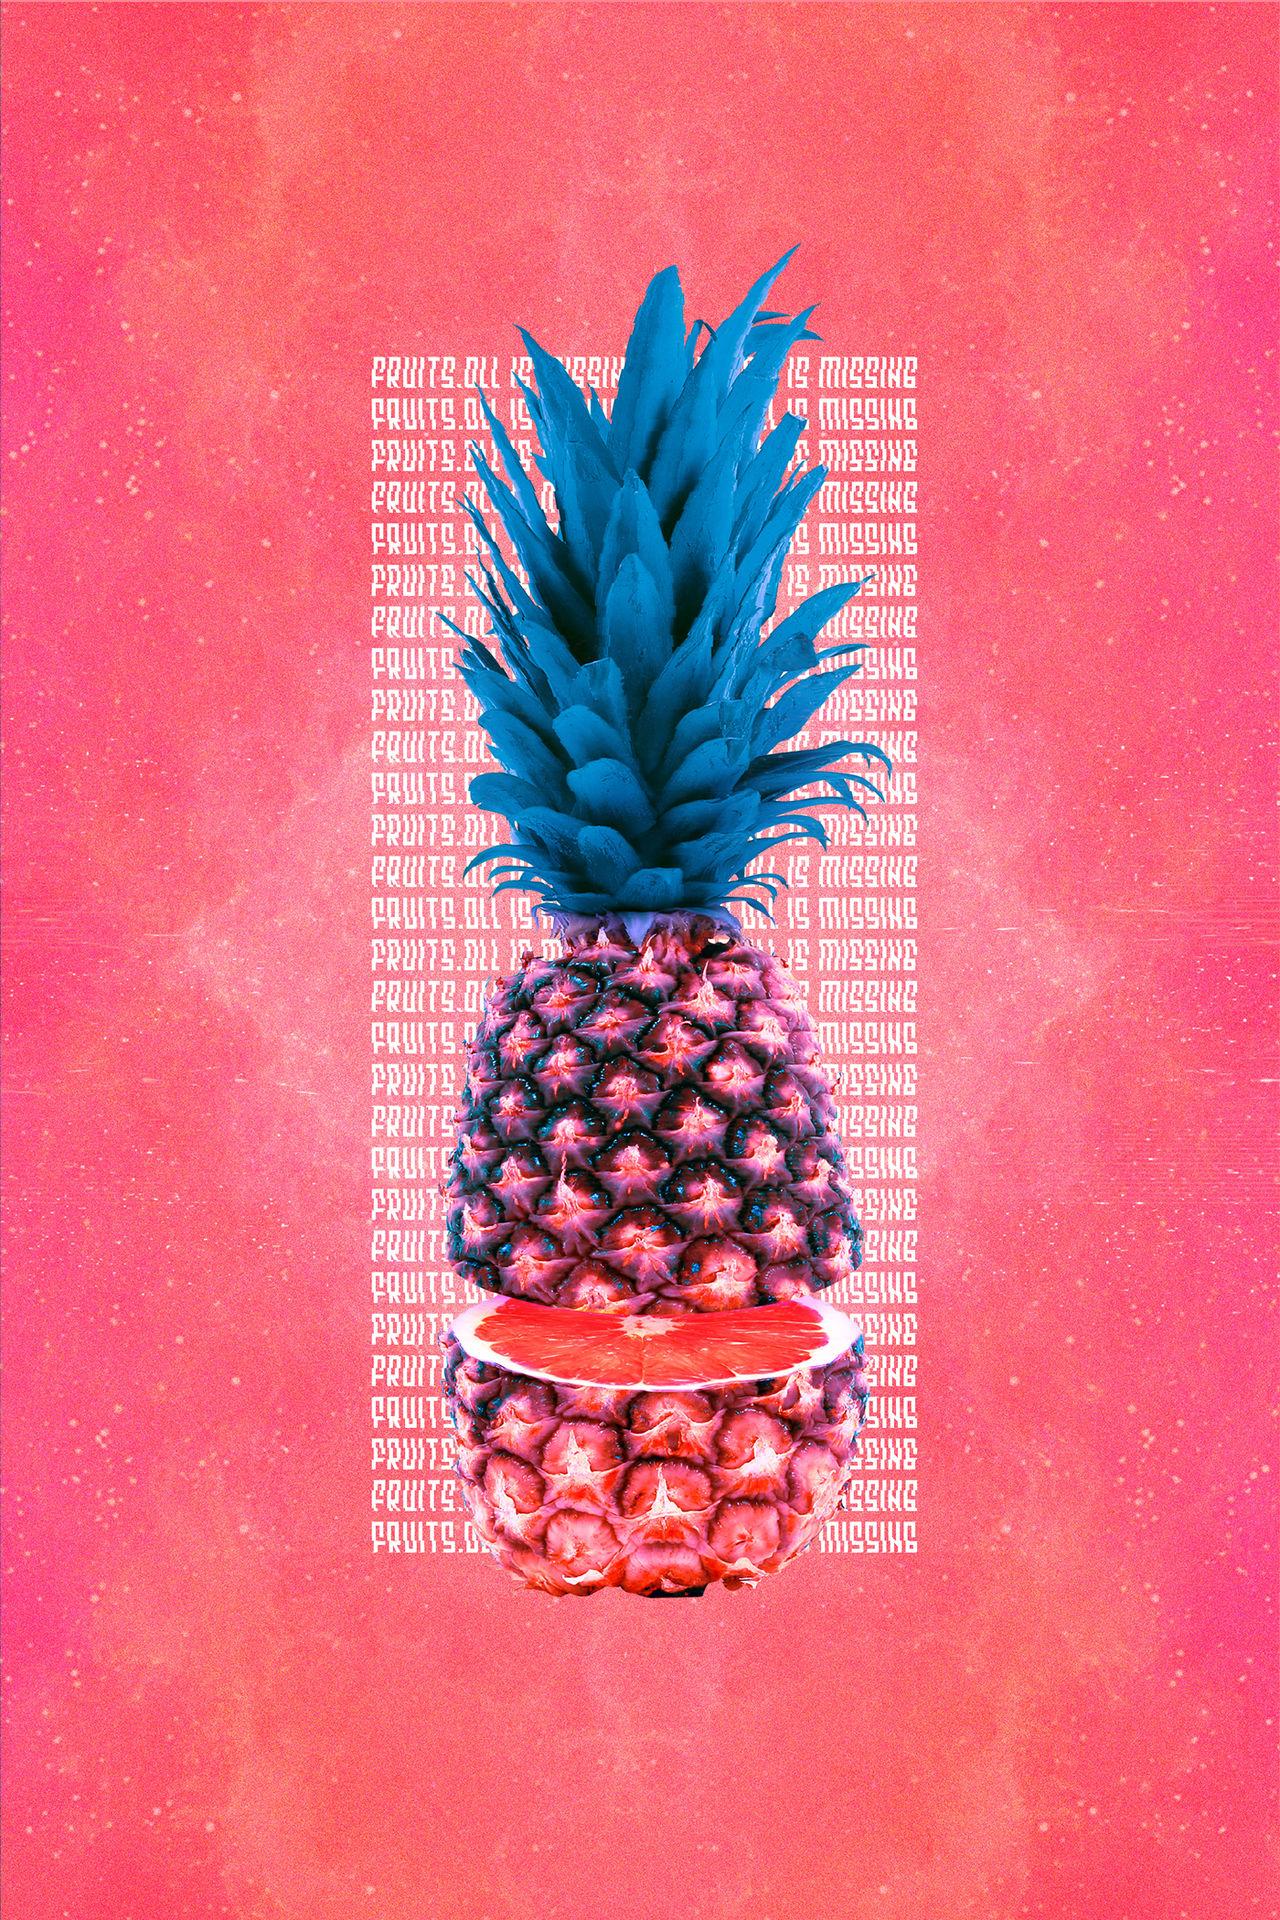 Fruit.dll is missing